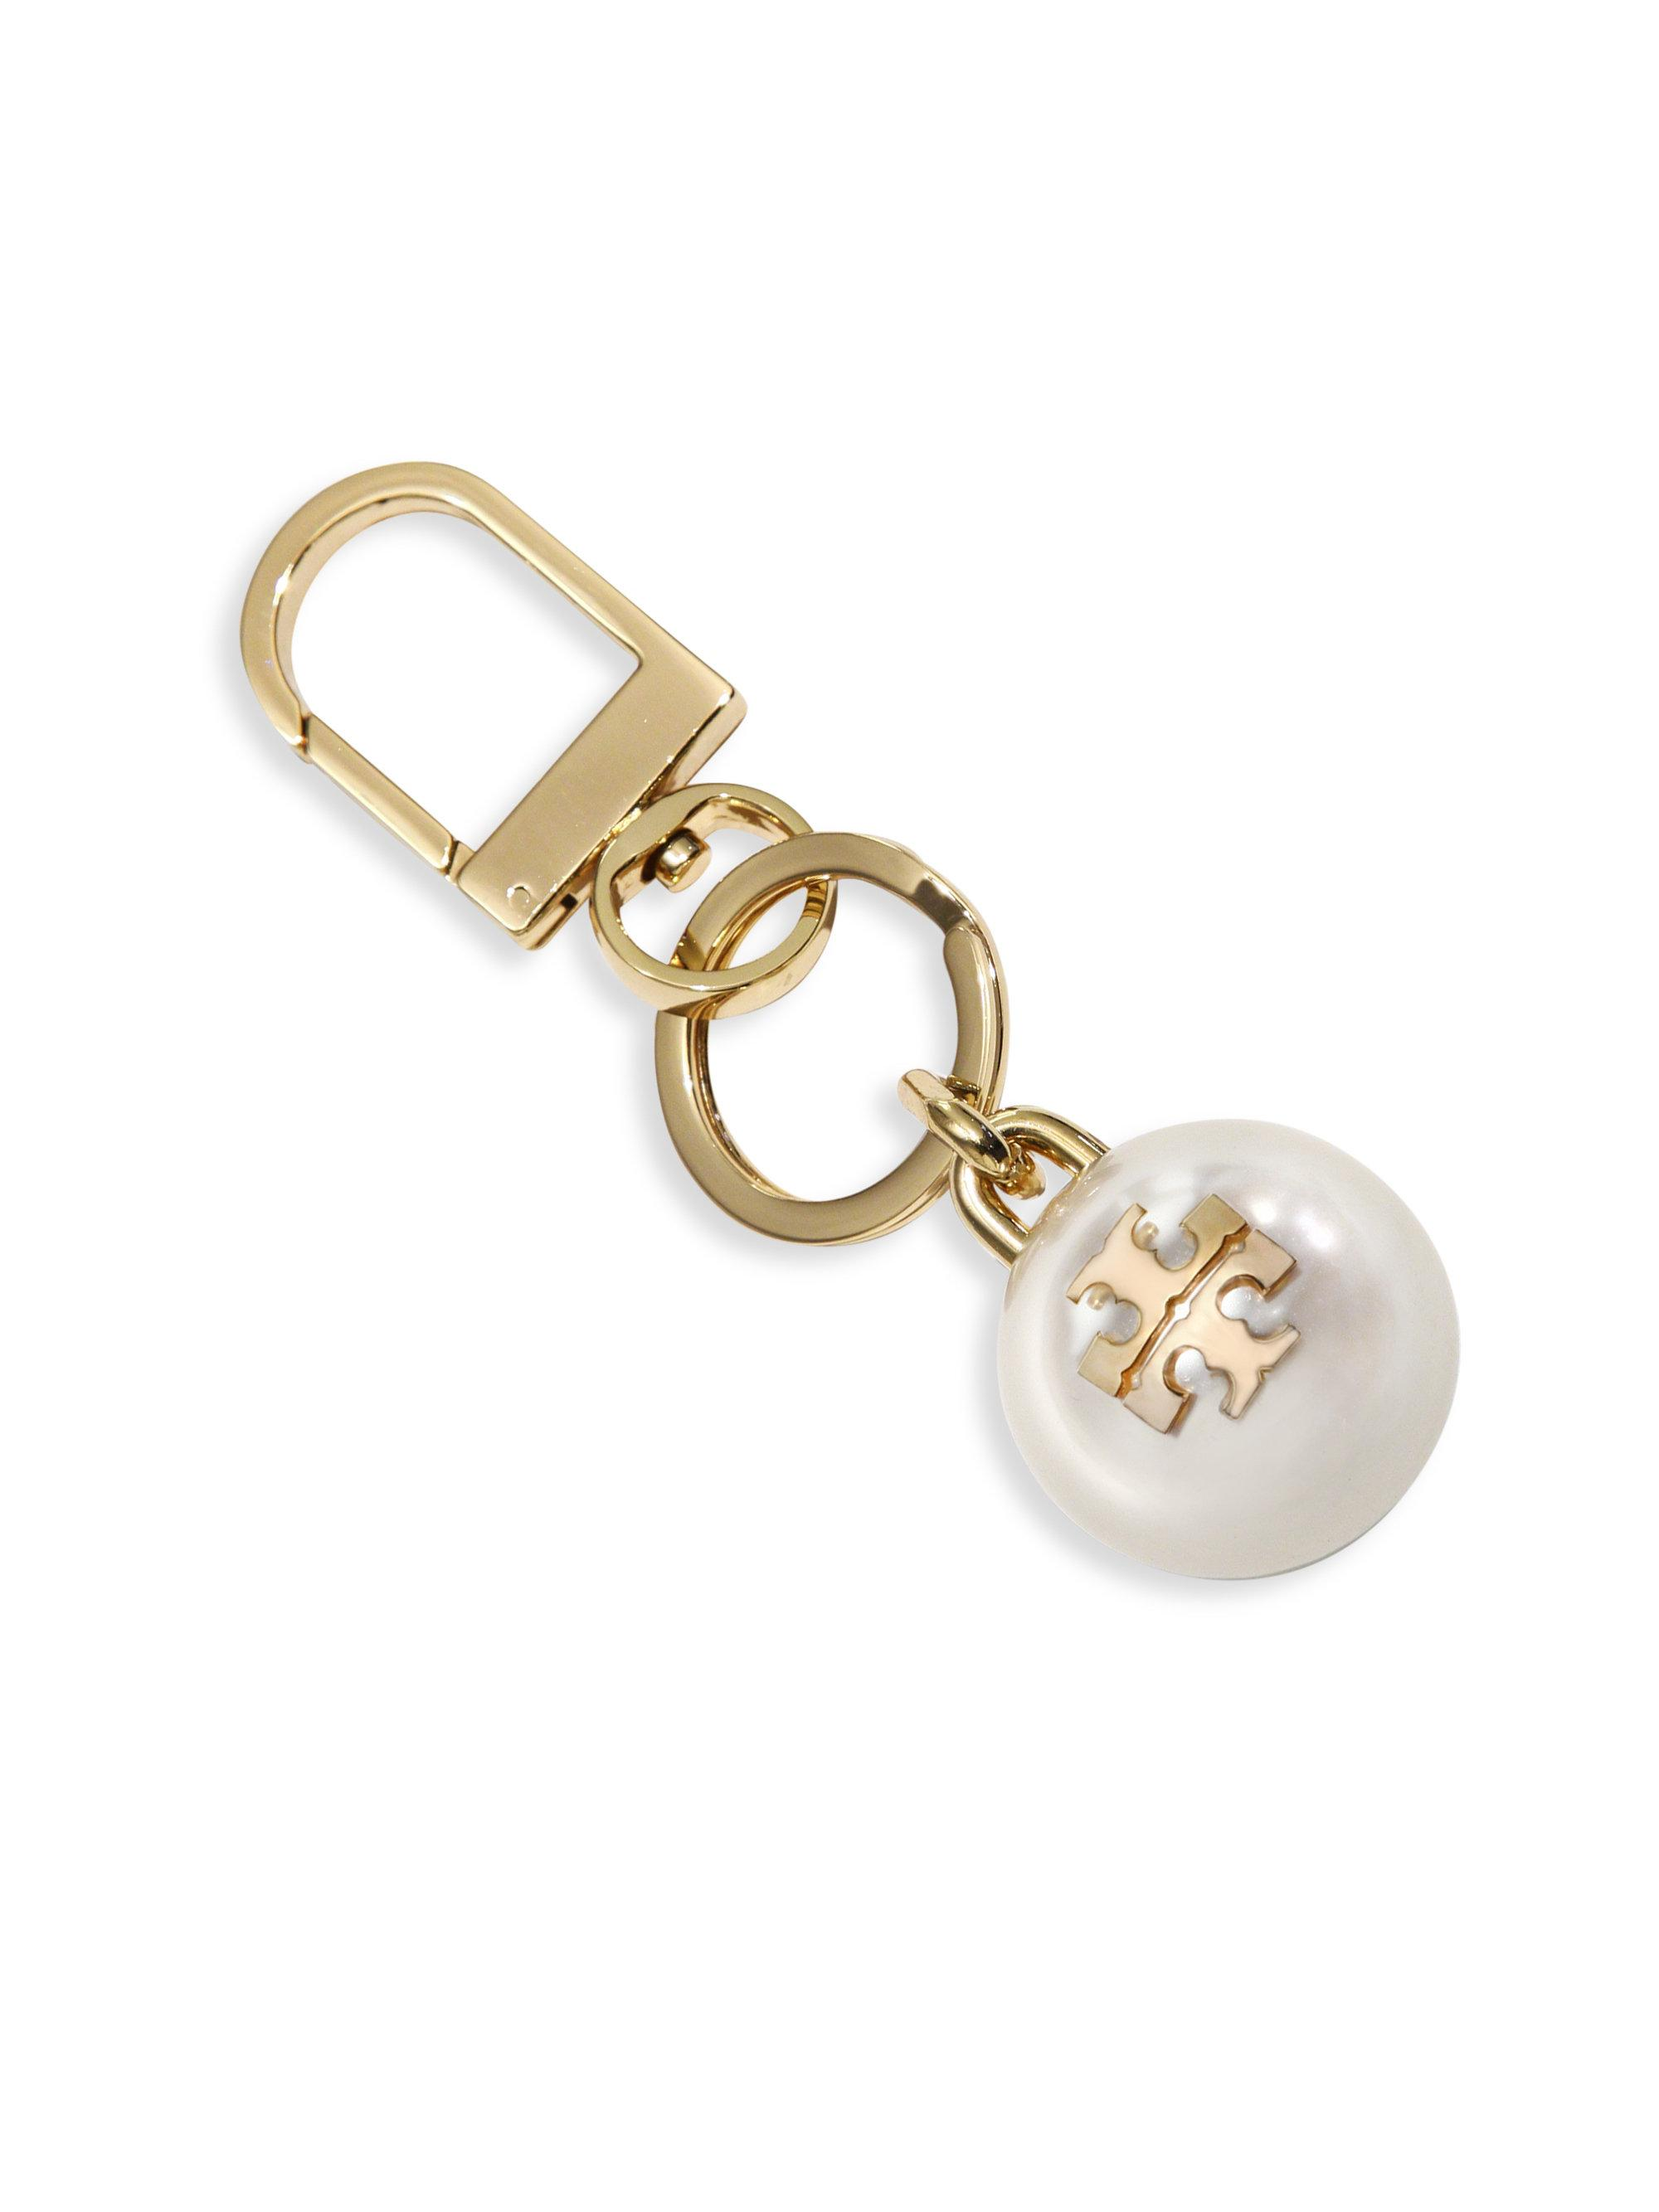 6889430a1bd9 Lyst - Tory Burch Faux-pearl Logo Key Chain in Metallic